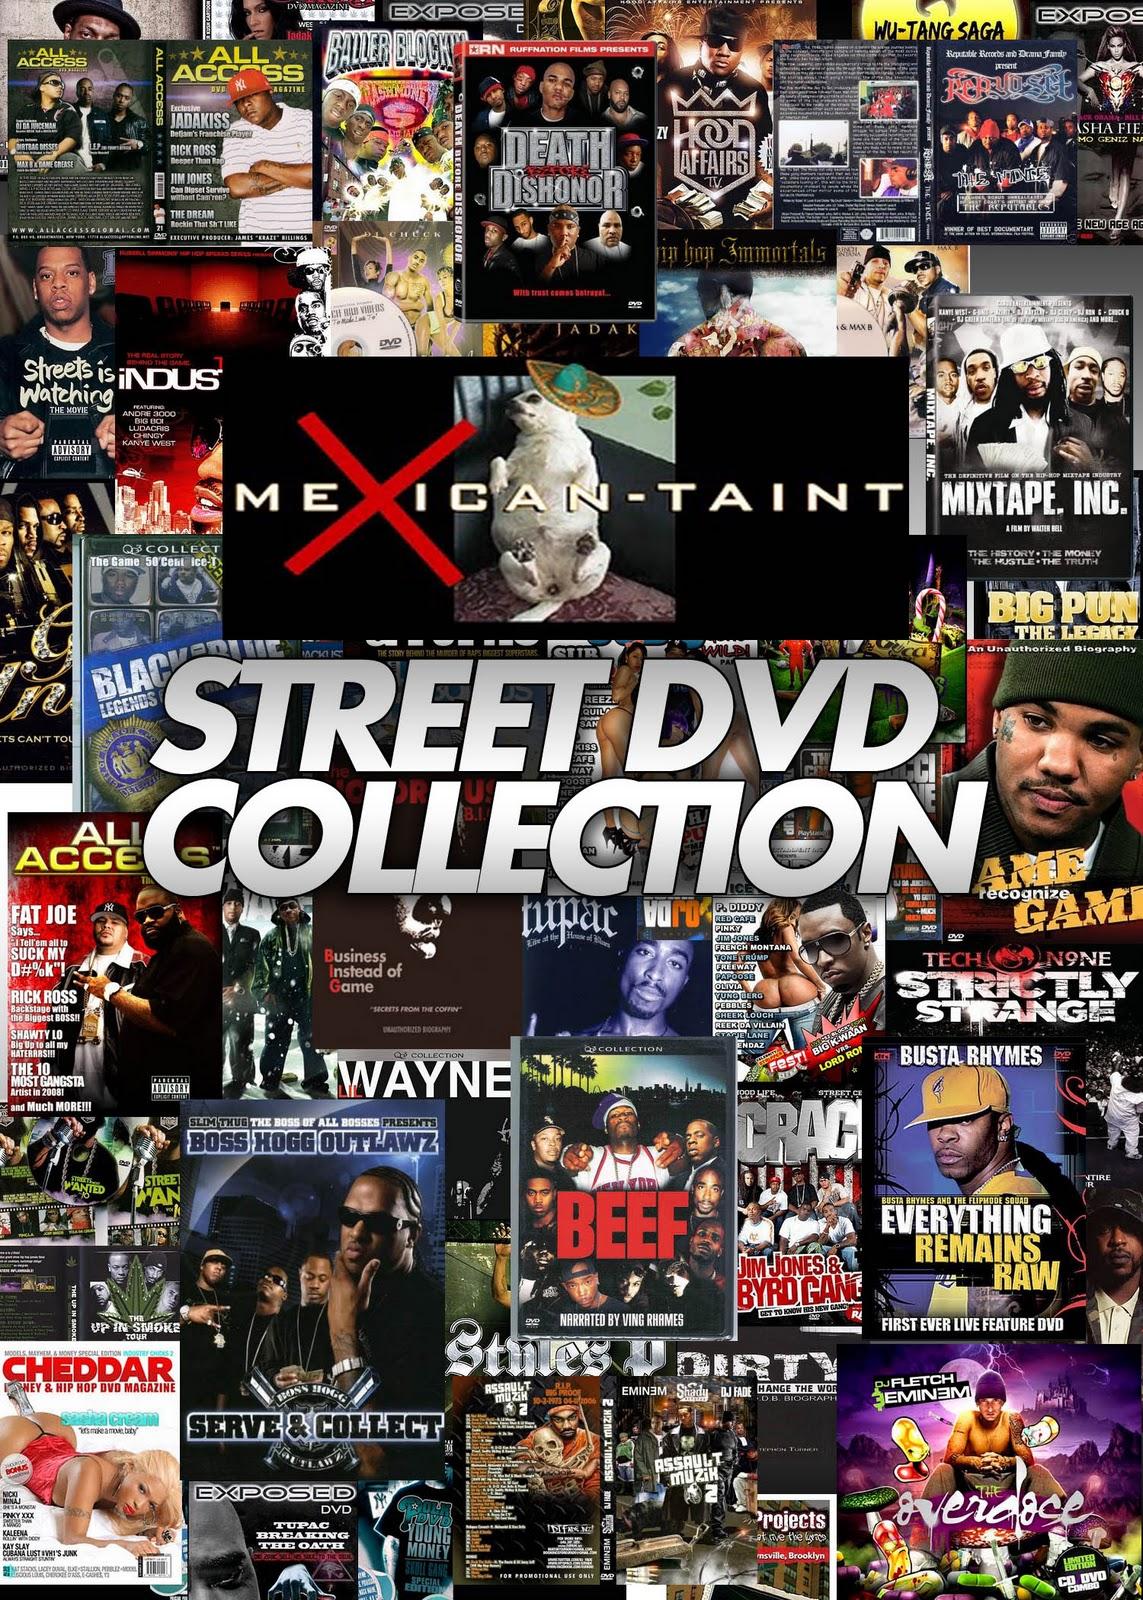 http://2.bp.blogspot.com/-YVjwdlpXrlU/TnX3B0_okdI/AAAAAAAAMZU/wlvnFhts8mE/s1600/Street-DVD-Collection.jpg